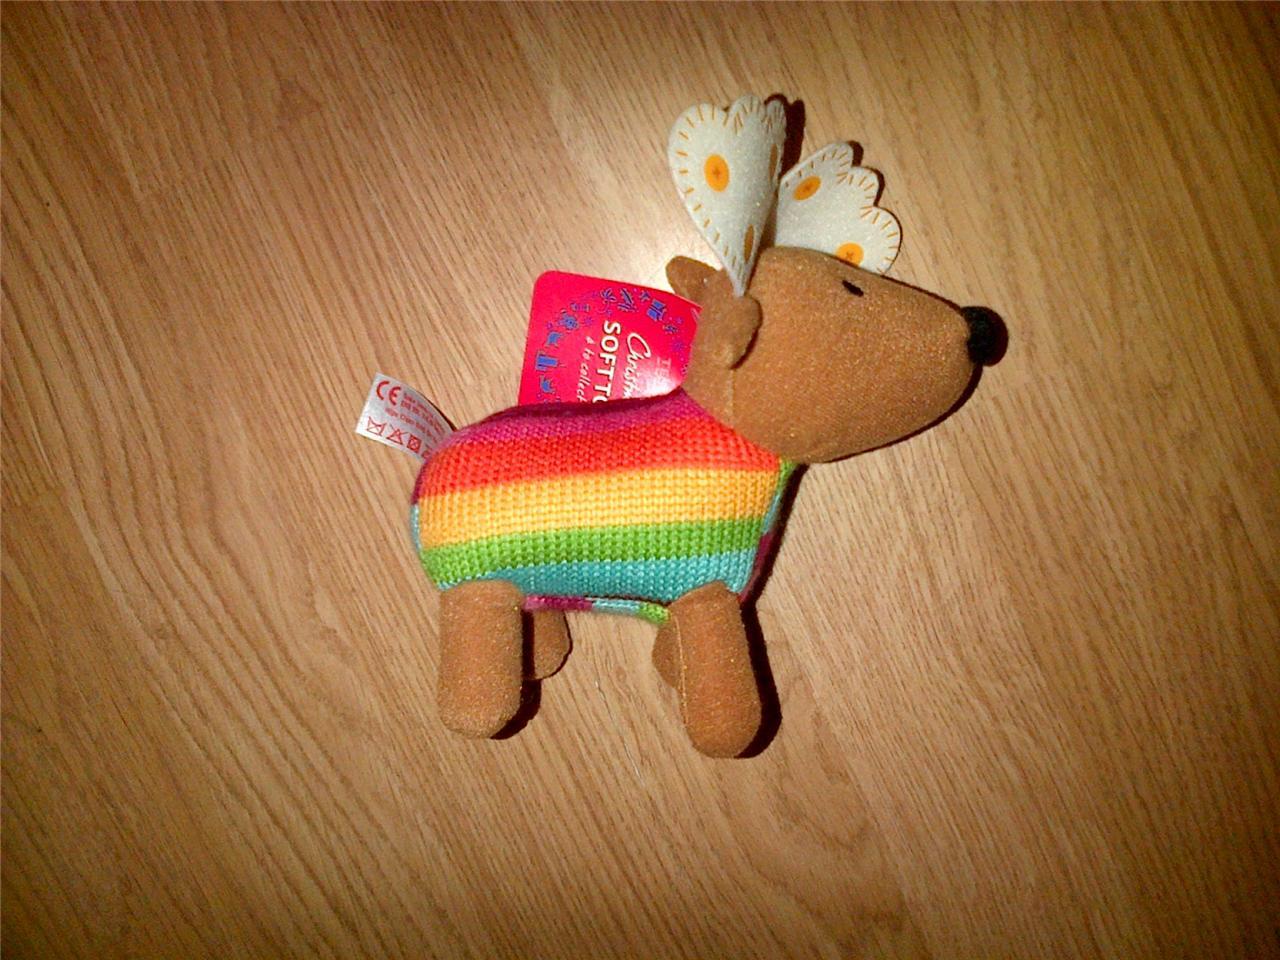 tesco baby chilly comforter soft hug toy snowman santa. Black Bedroom Furniture Sets. Home Design Ideas